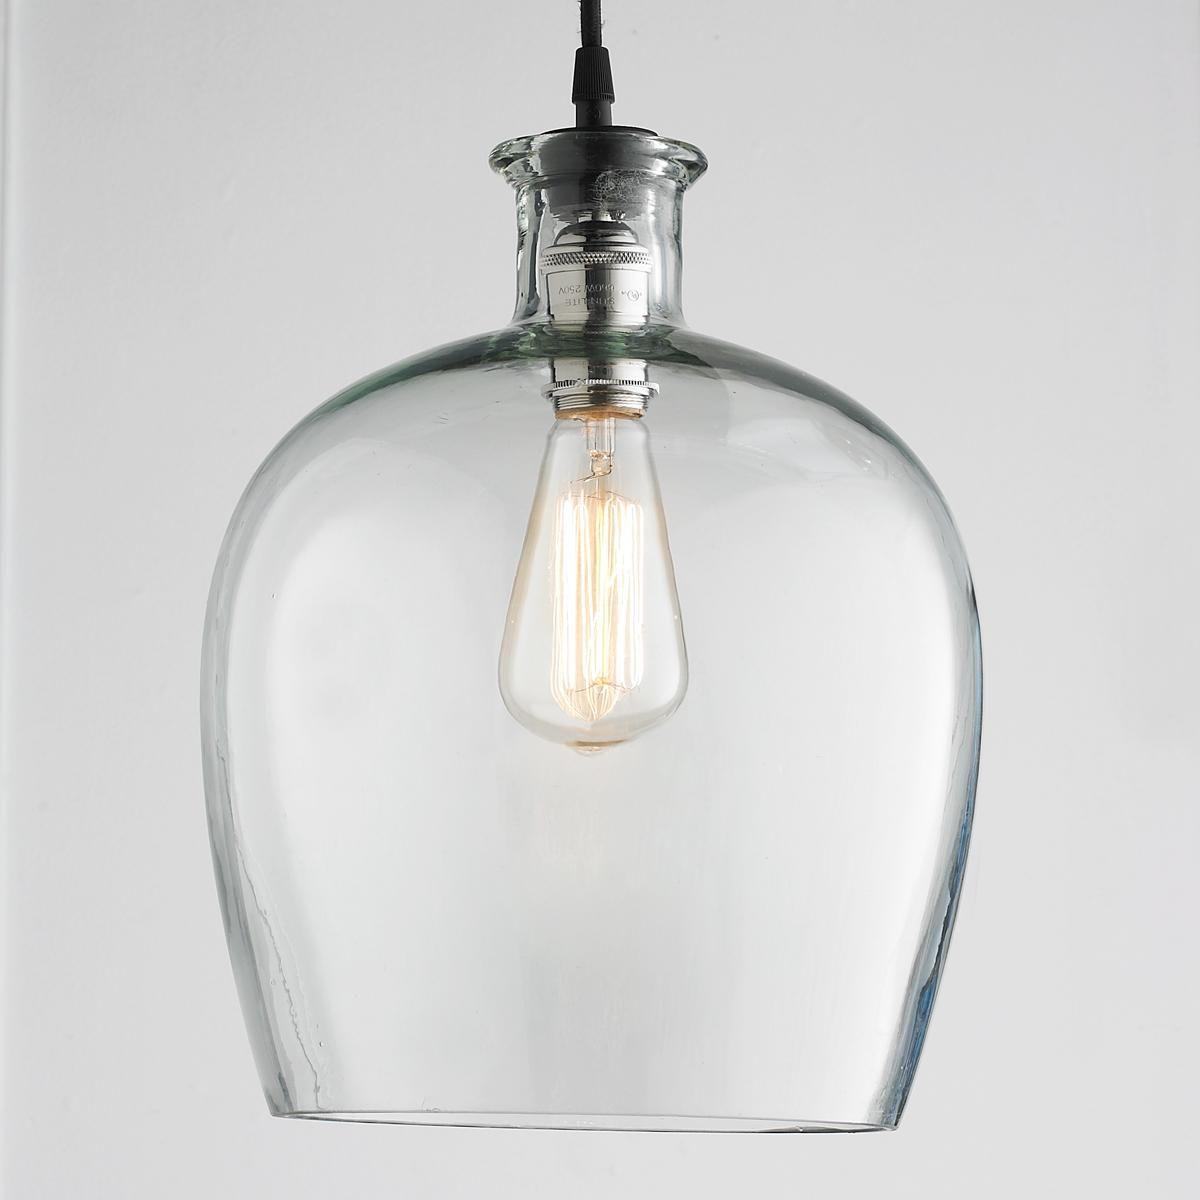 Carafe glass pendant light large kitchen lighting pinterest